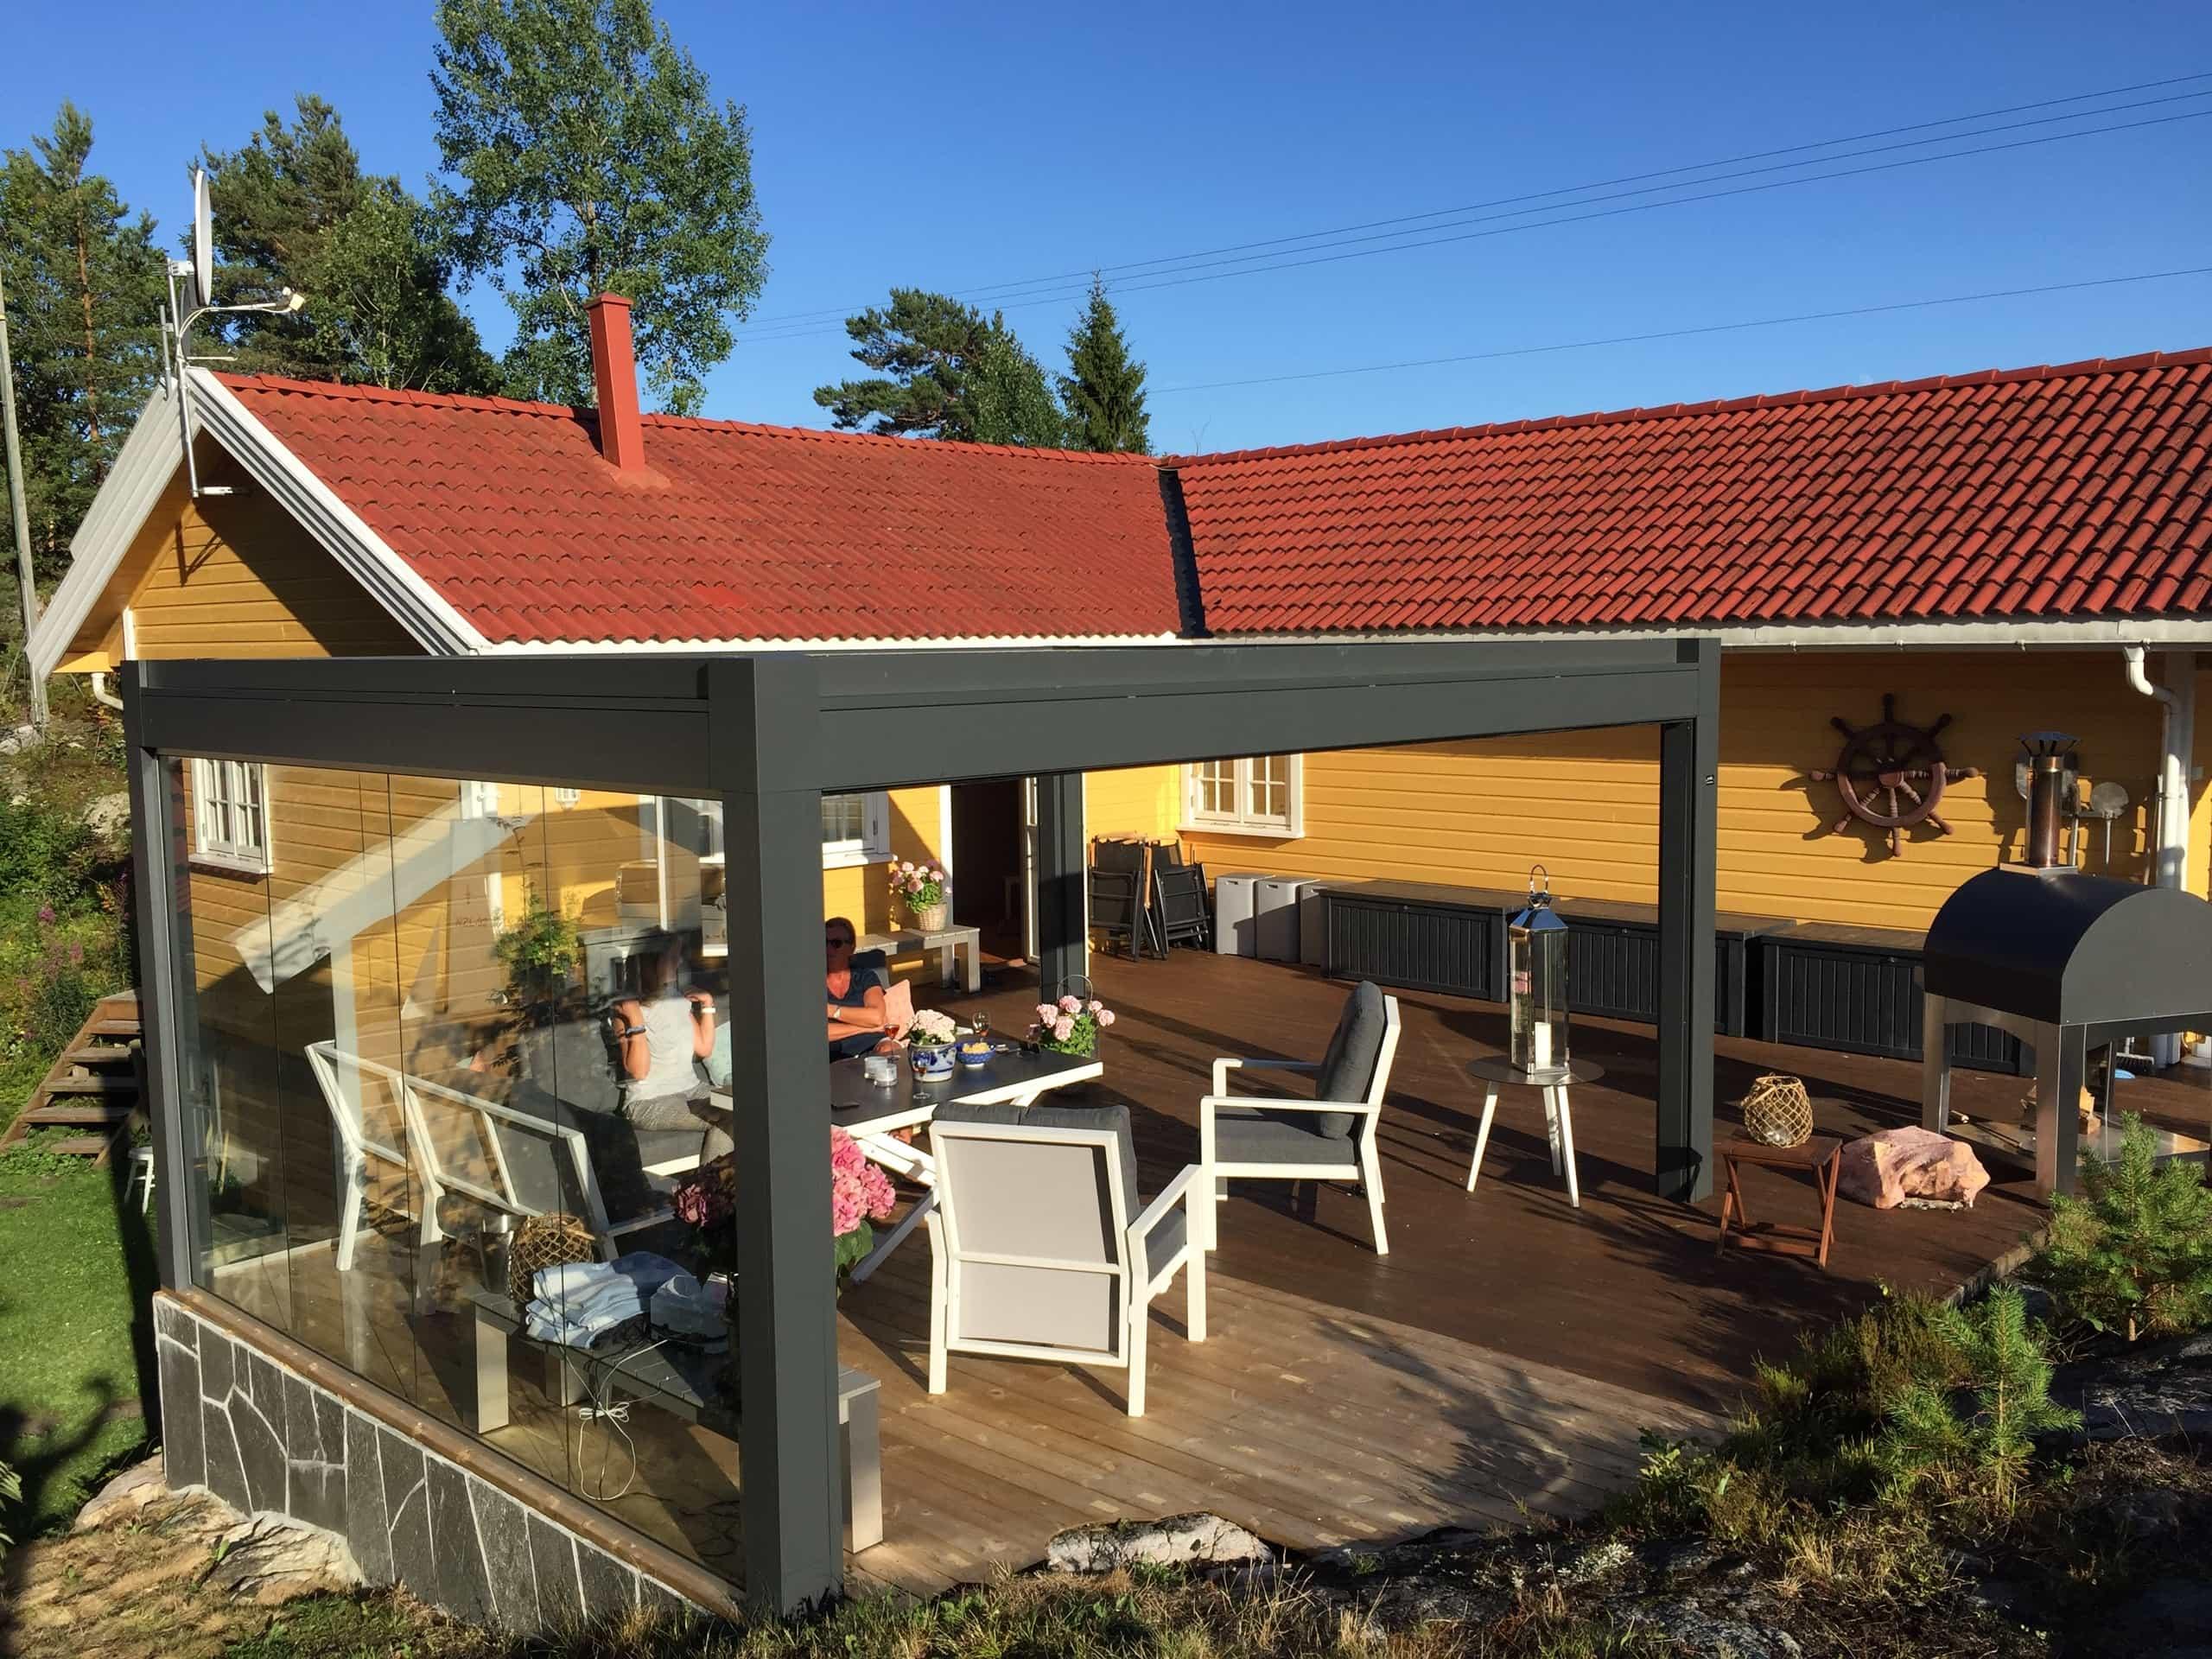 Pergolasystem til privatkunde i Kragerø